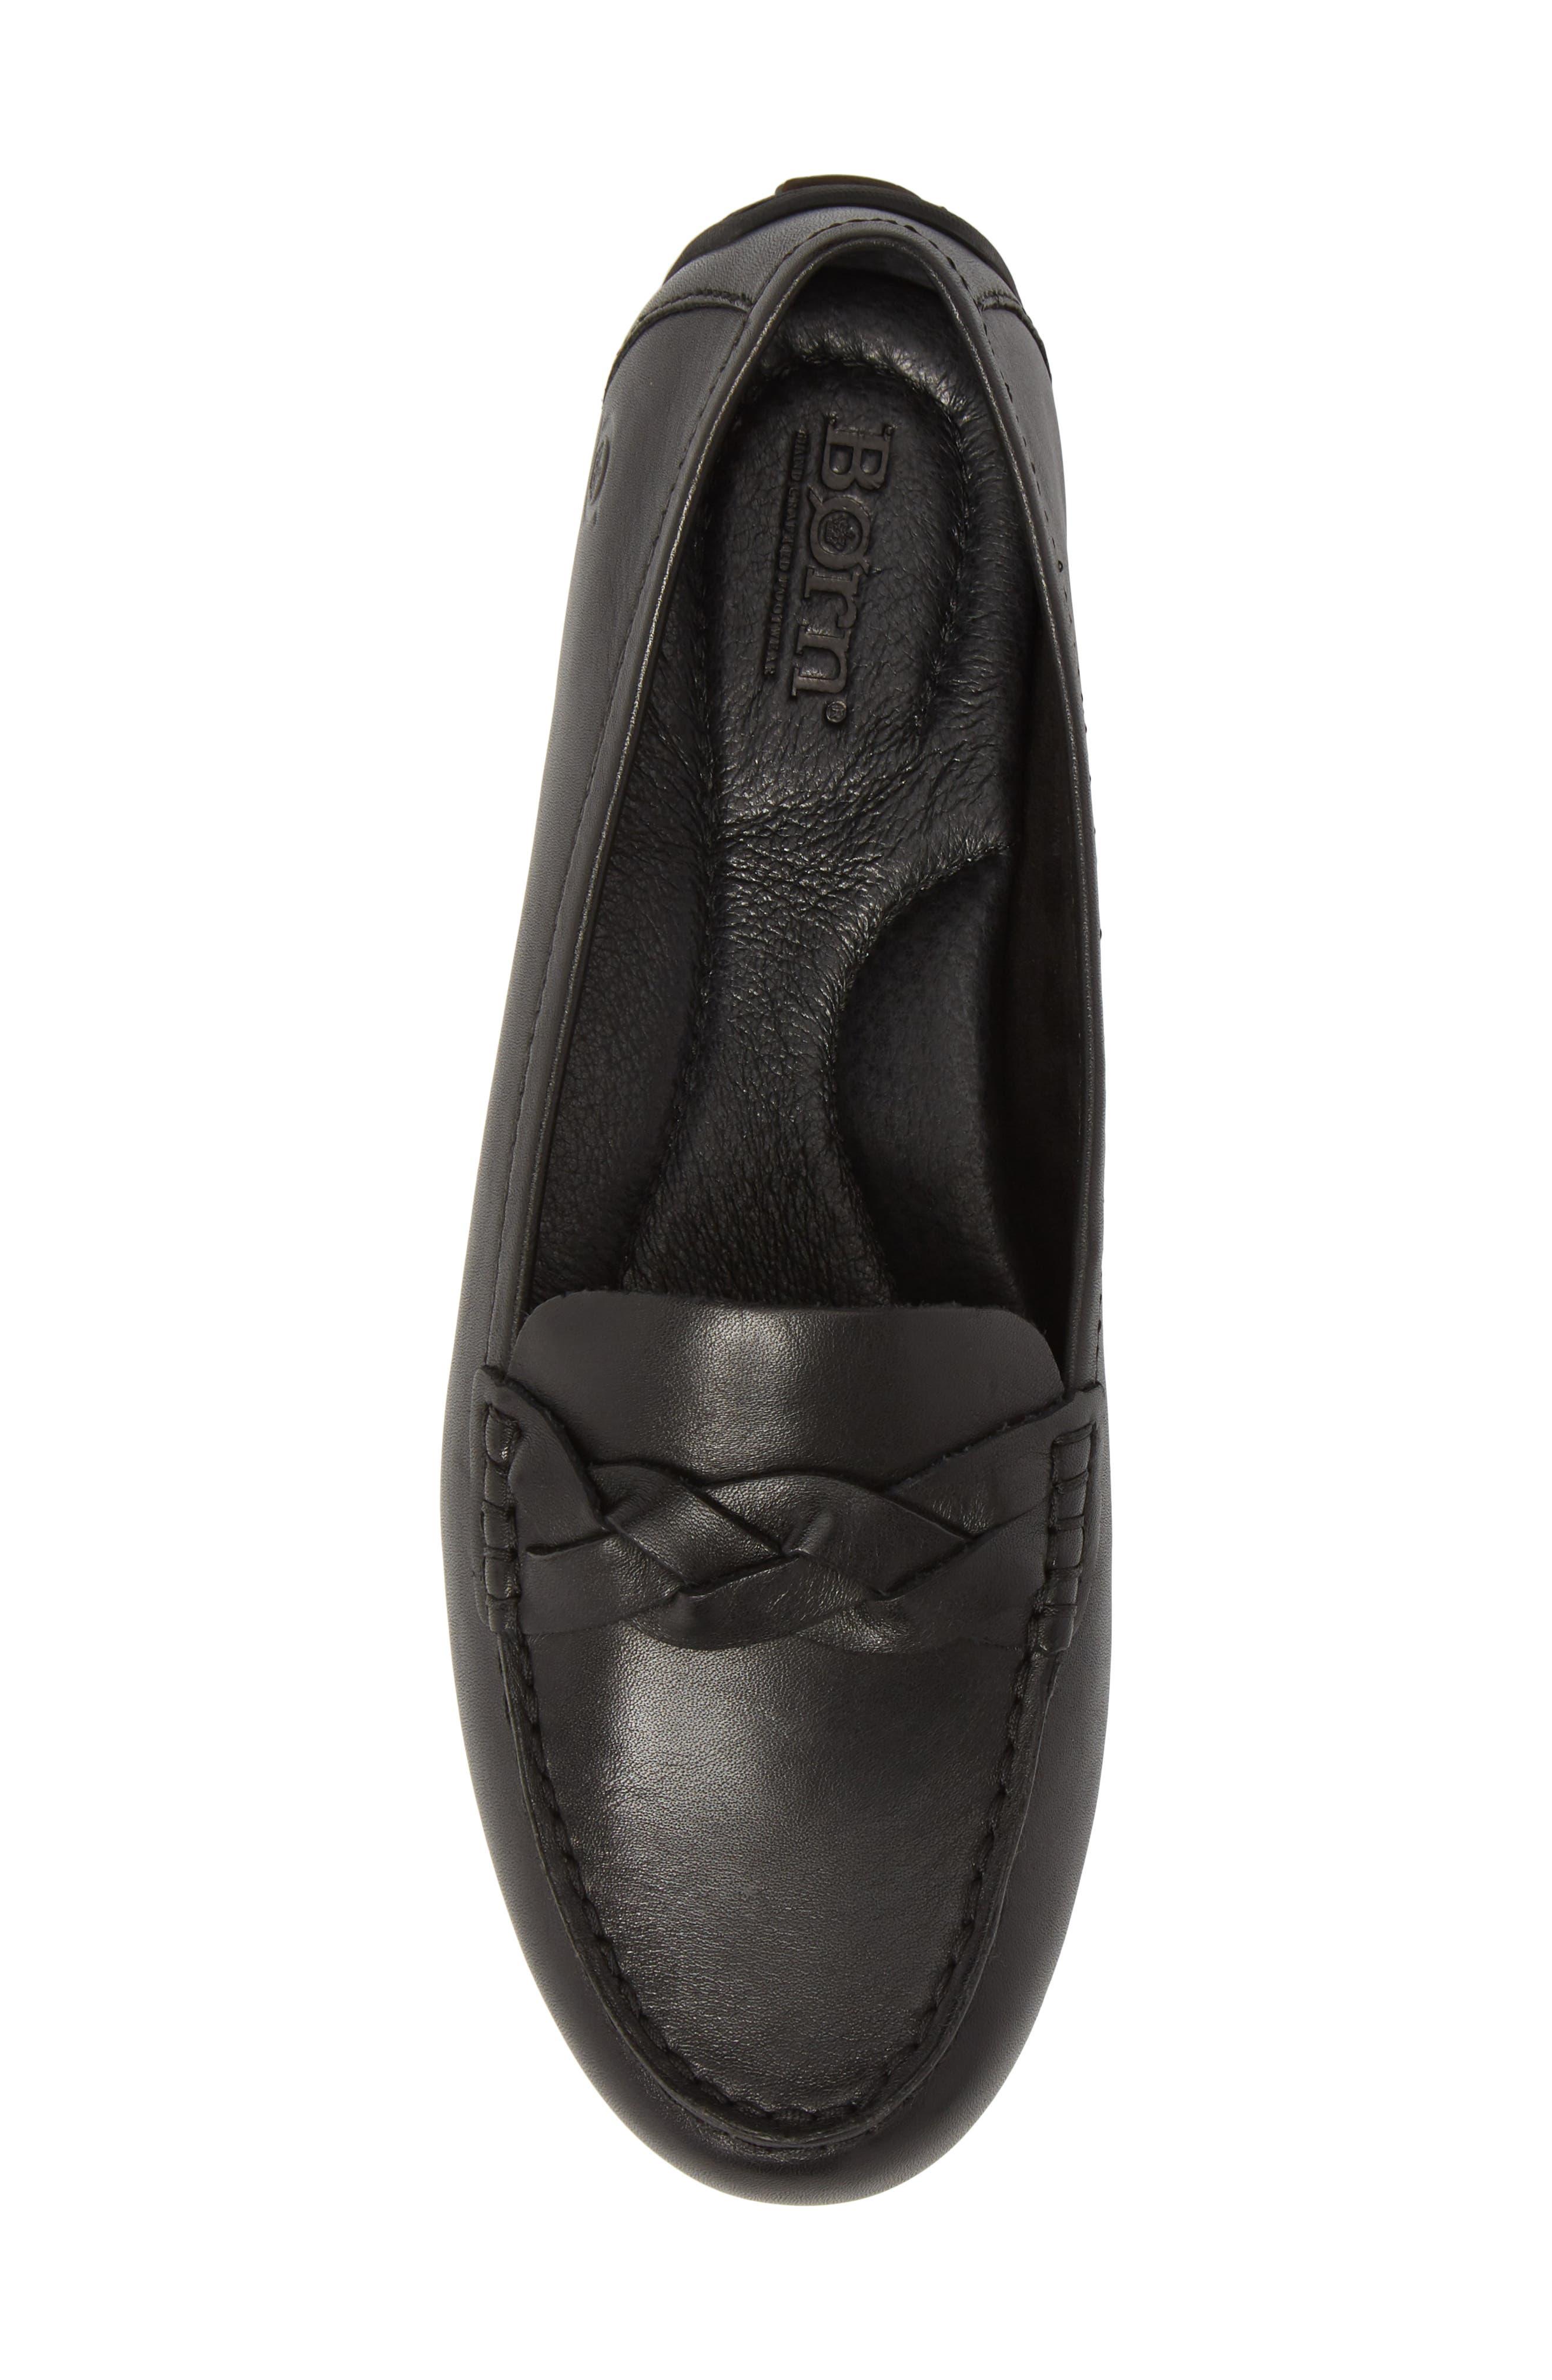 Kasa Loafer,                             Alternate thumbnail 5, color,                             Black Leather